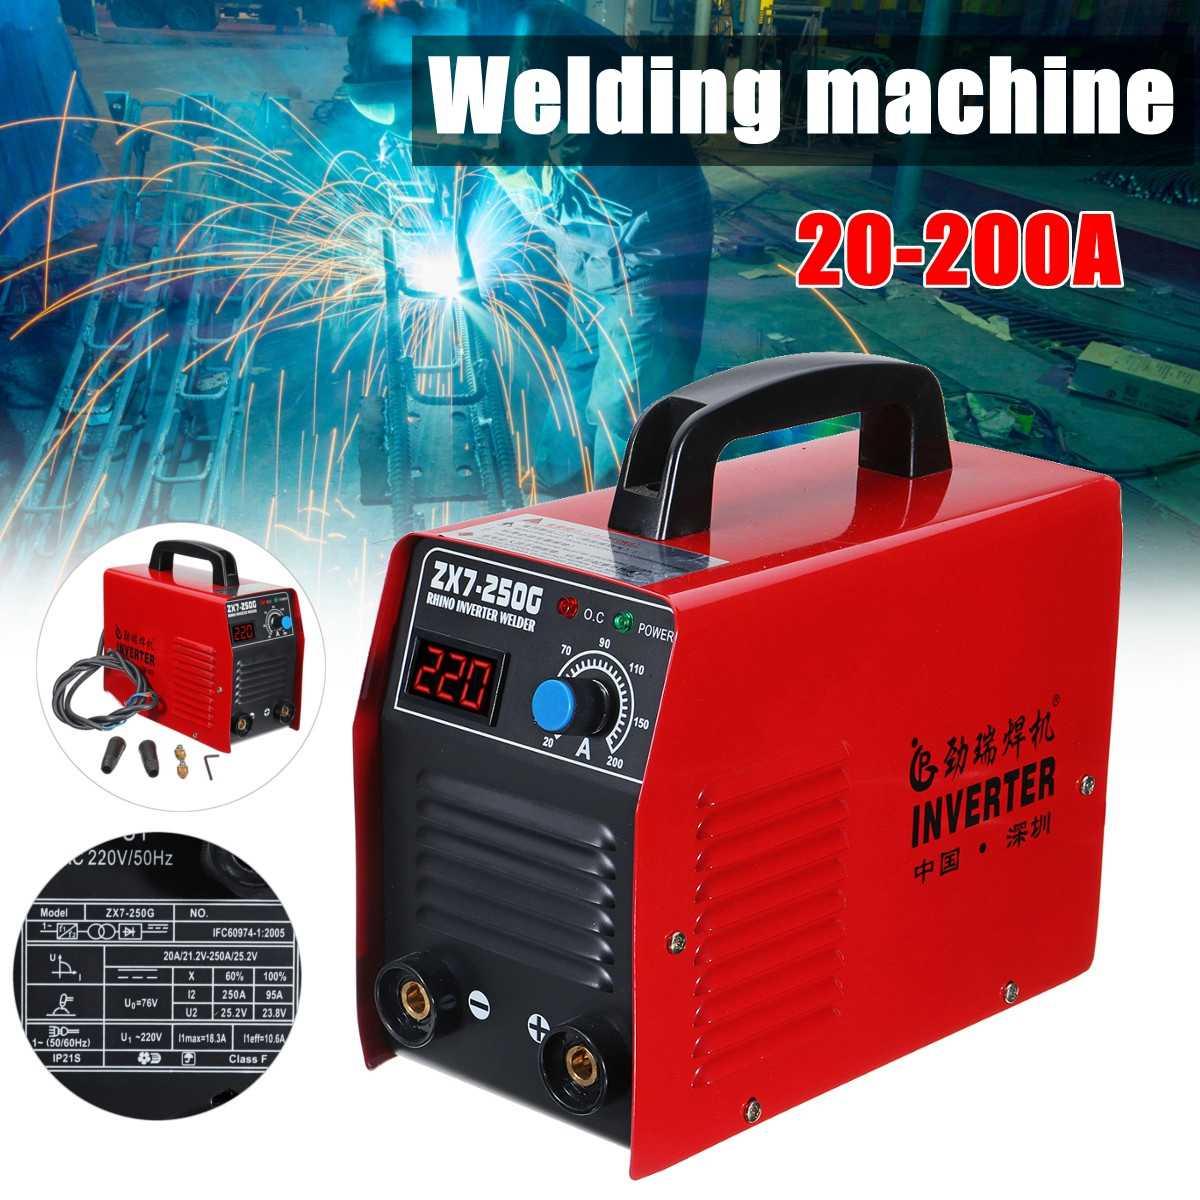 Portable Electric Welder ZX7-250G  IGBT/MMA/ARC Inverter Power Welding Machine Soldering Tool